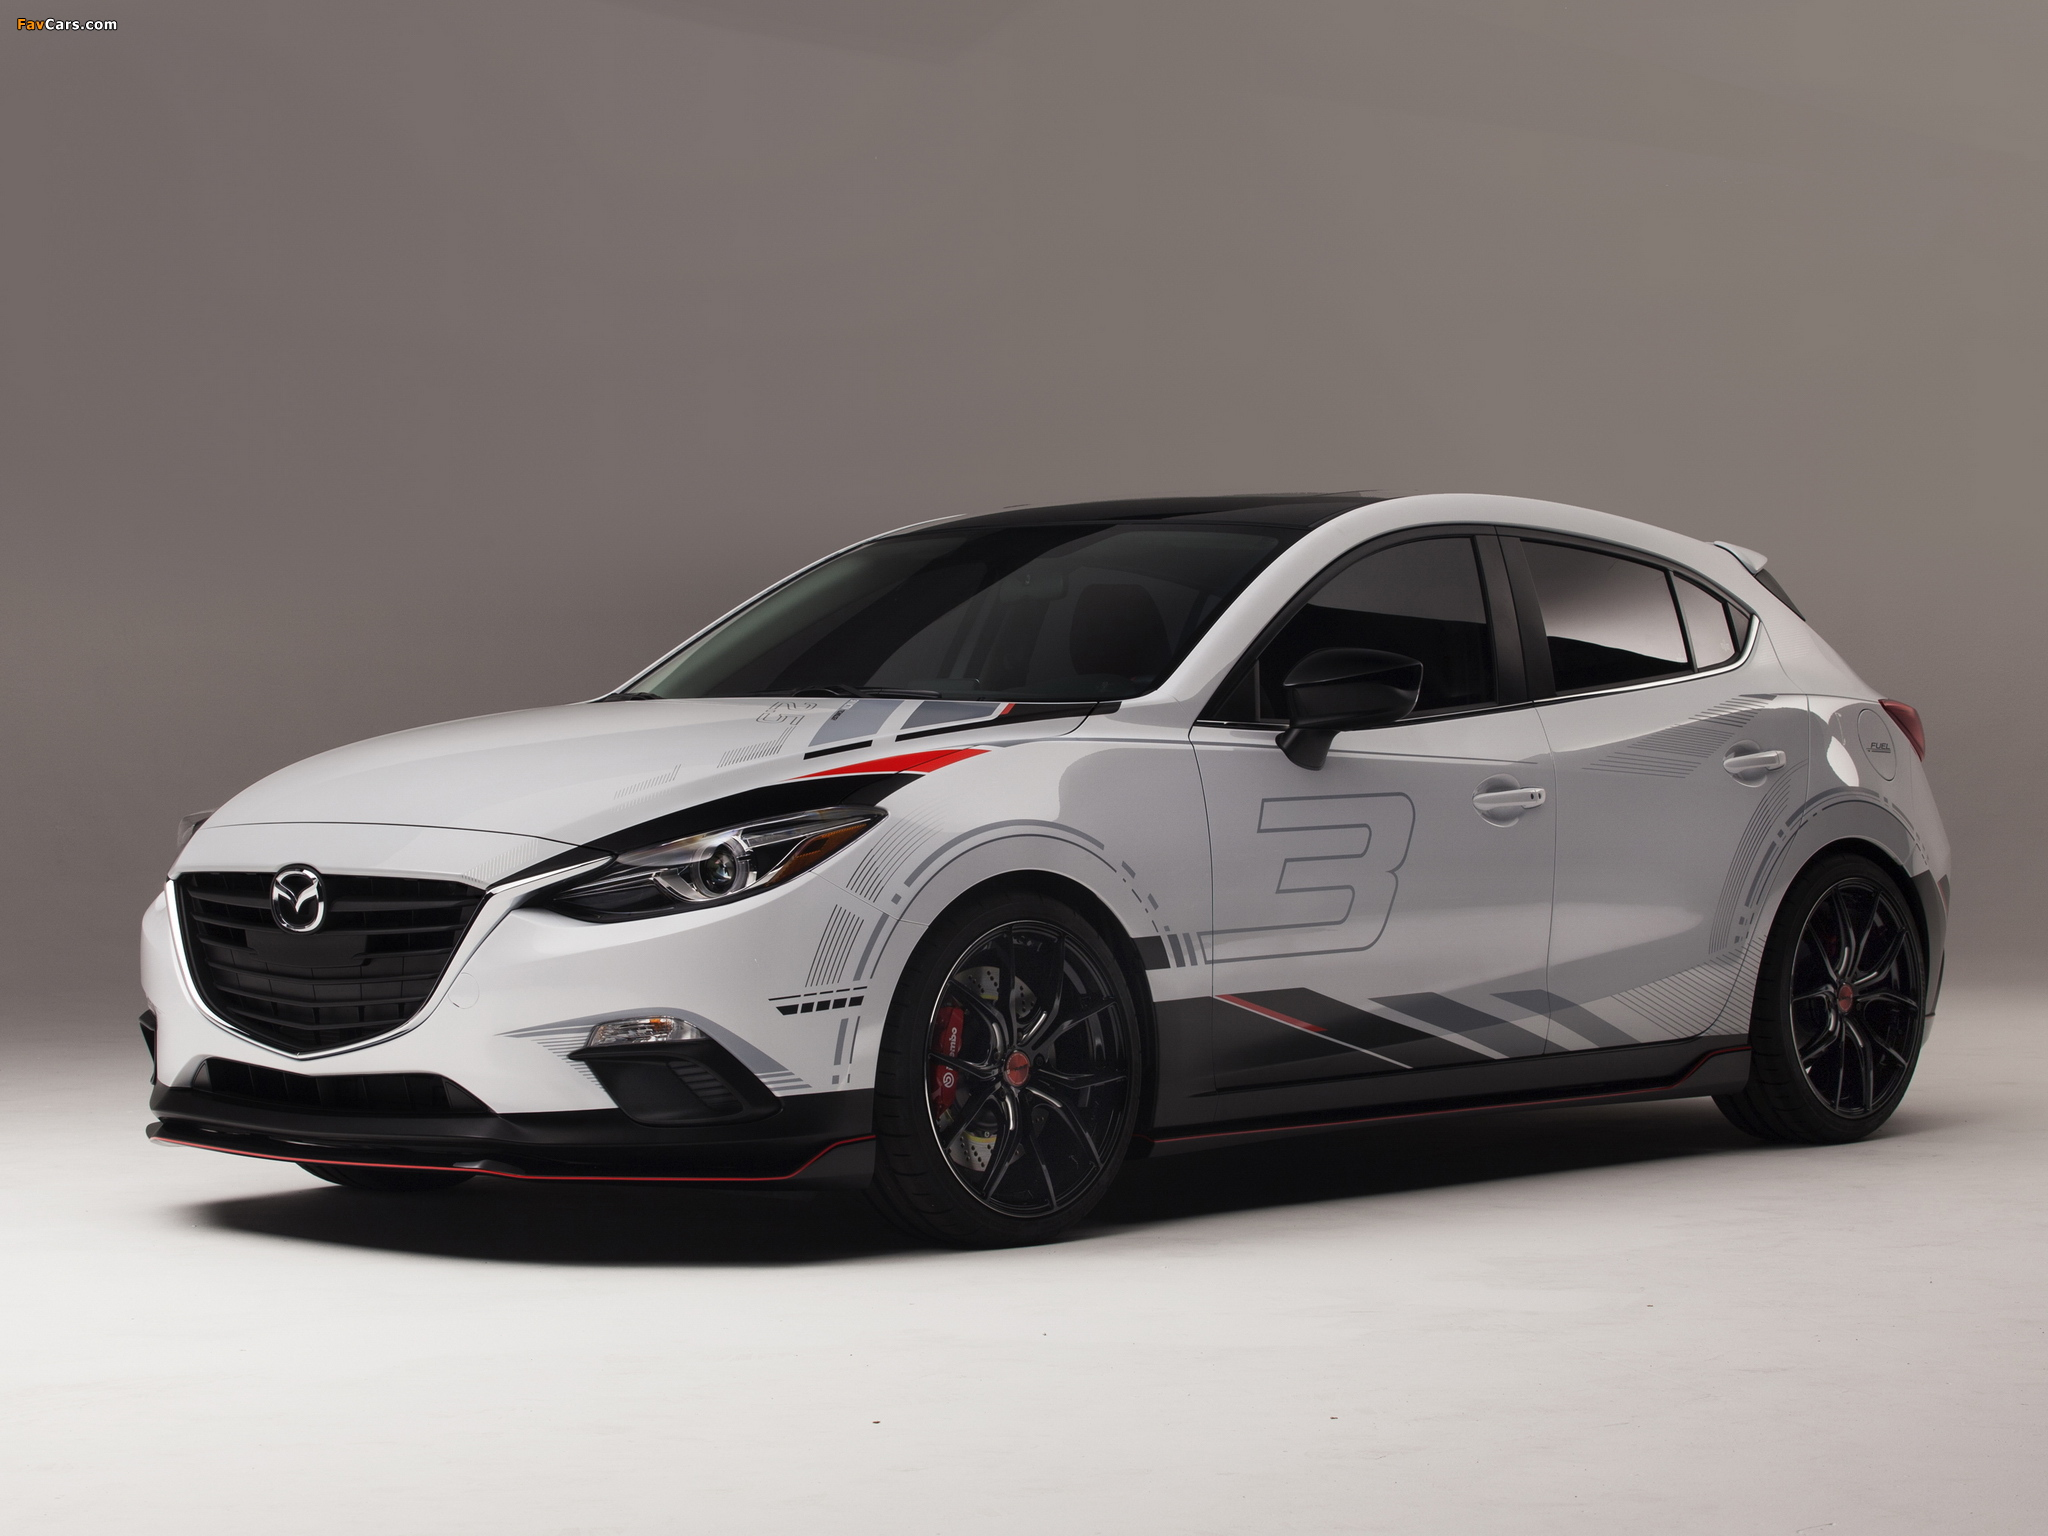 Mazda Club Sport 3 Concept (BM) 2013 pictures (2048 x 1536)